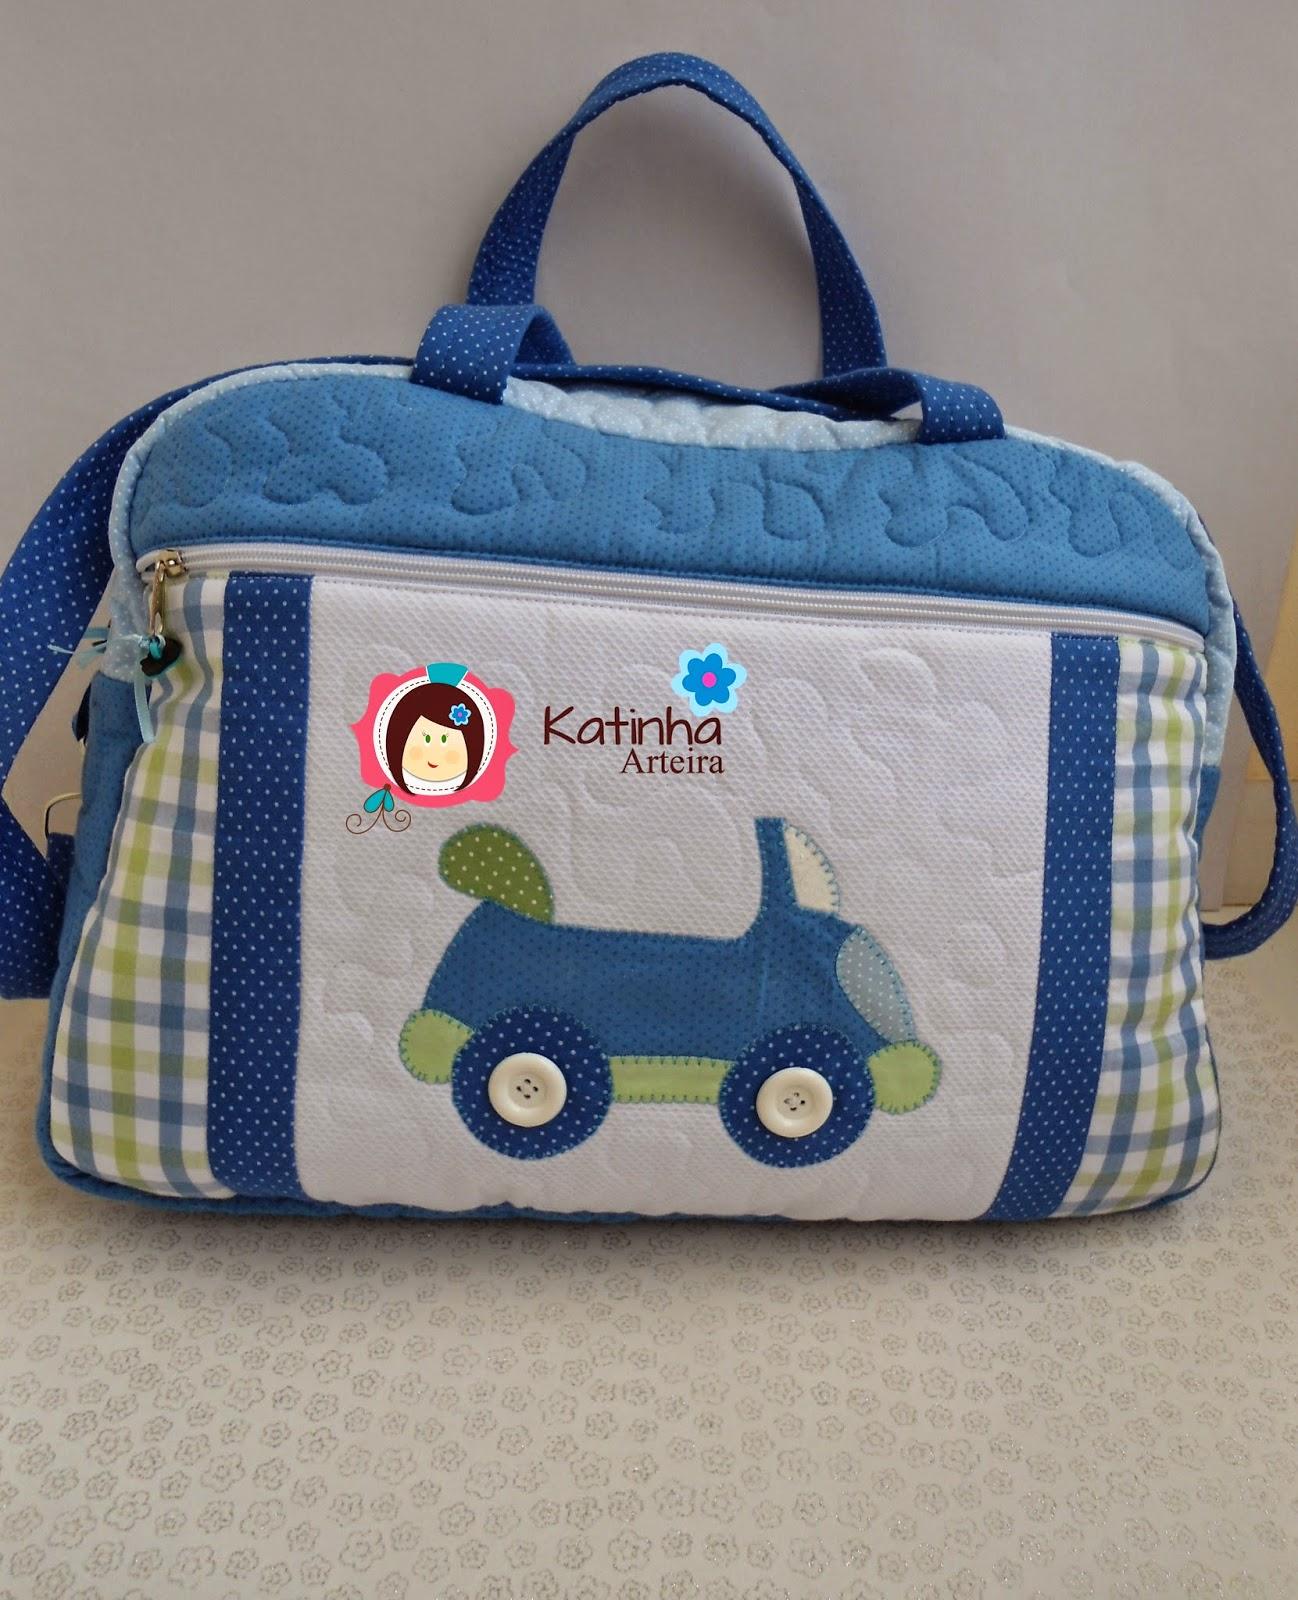 Bolsa De Tecido Bebe : Katinha arteira kit passeio beb? menino